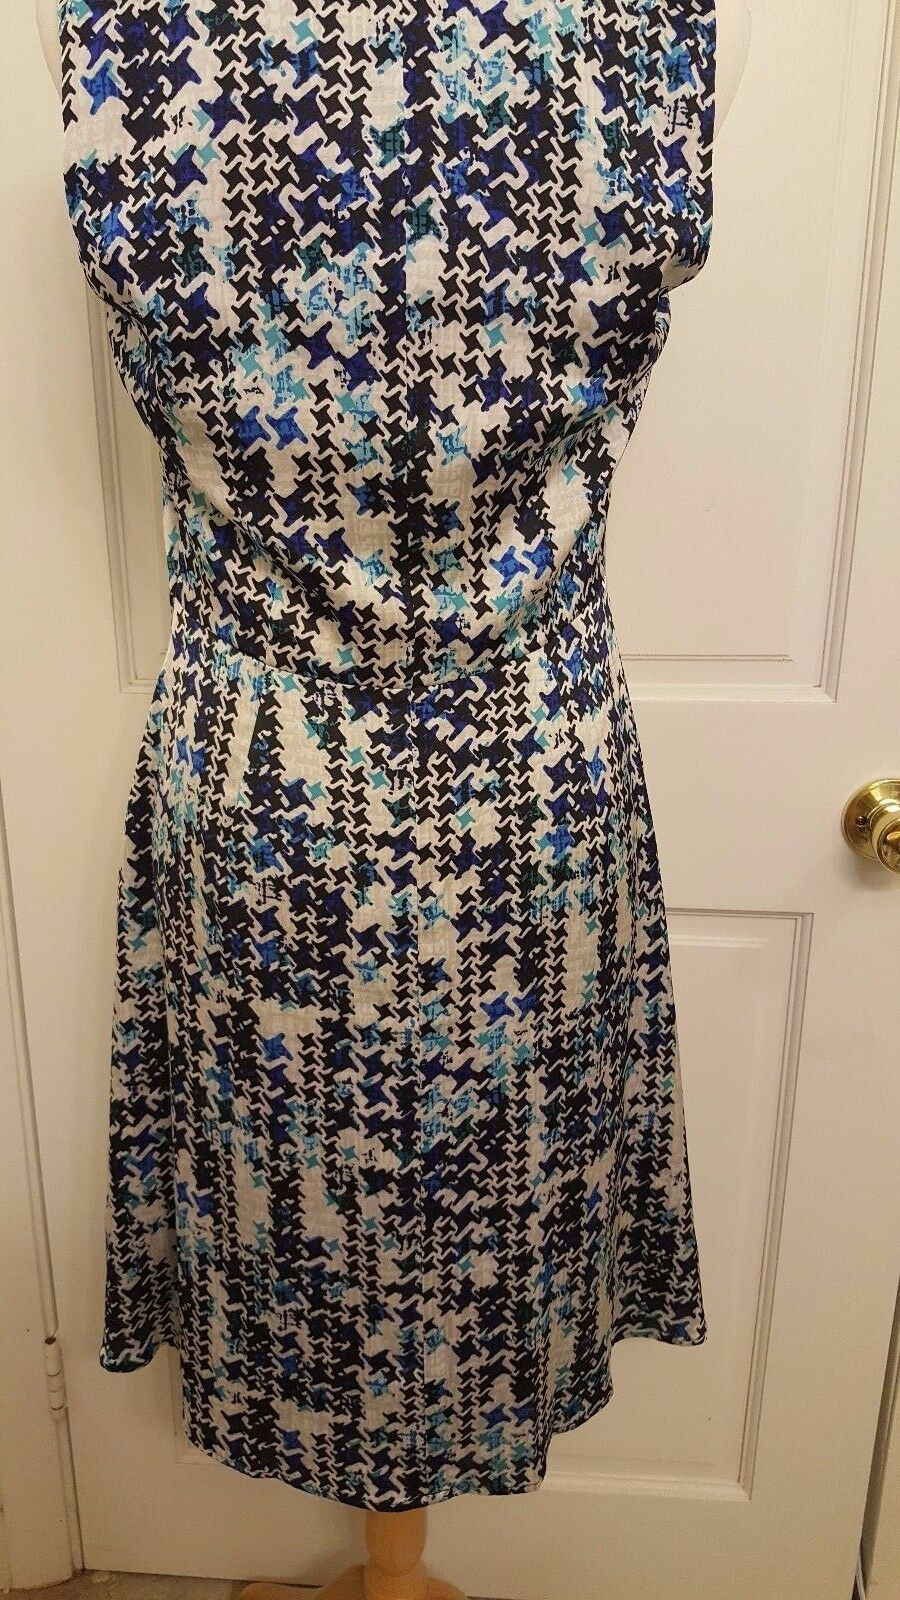 Designer Karl Lagerfeld Multicolor bluee Floral Floral Floral Sleeveless Runway Dress Size 8 d32d00